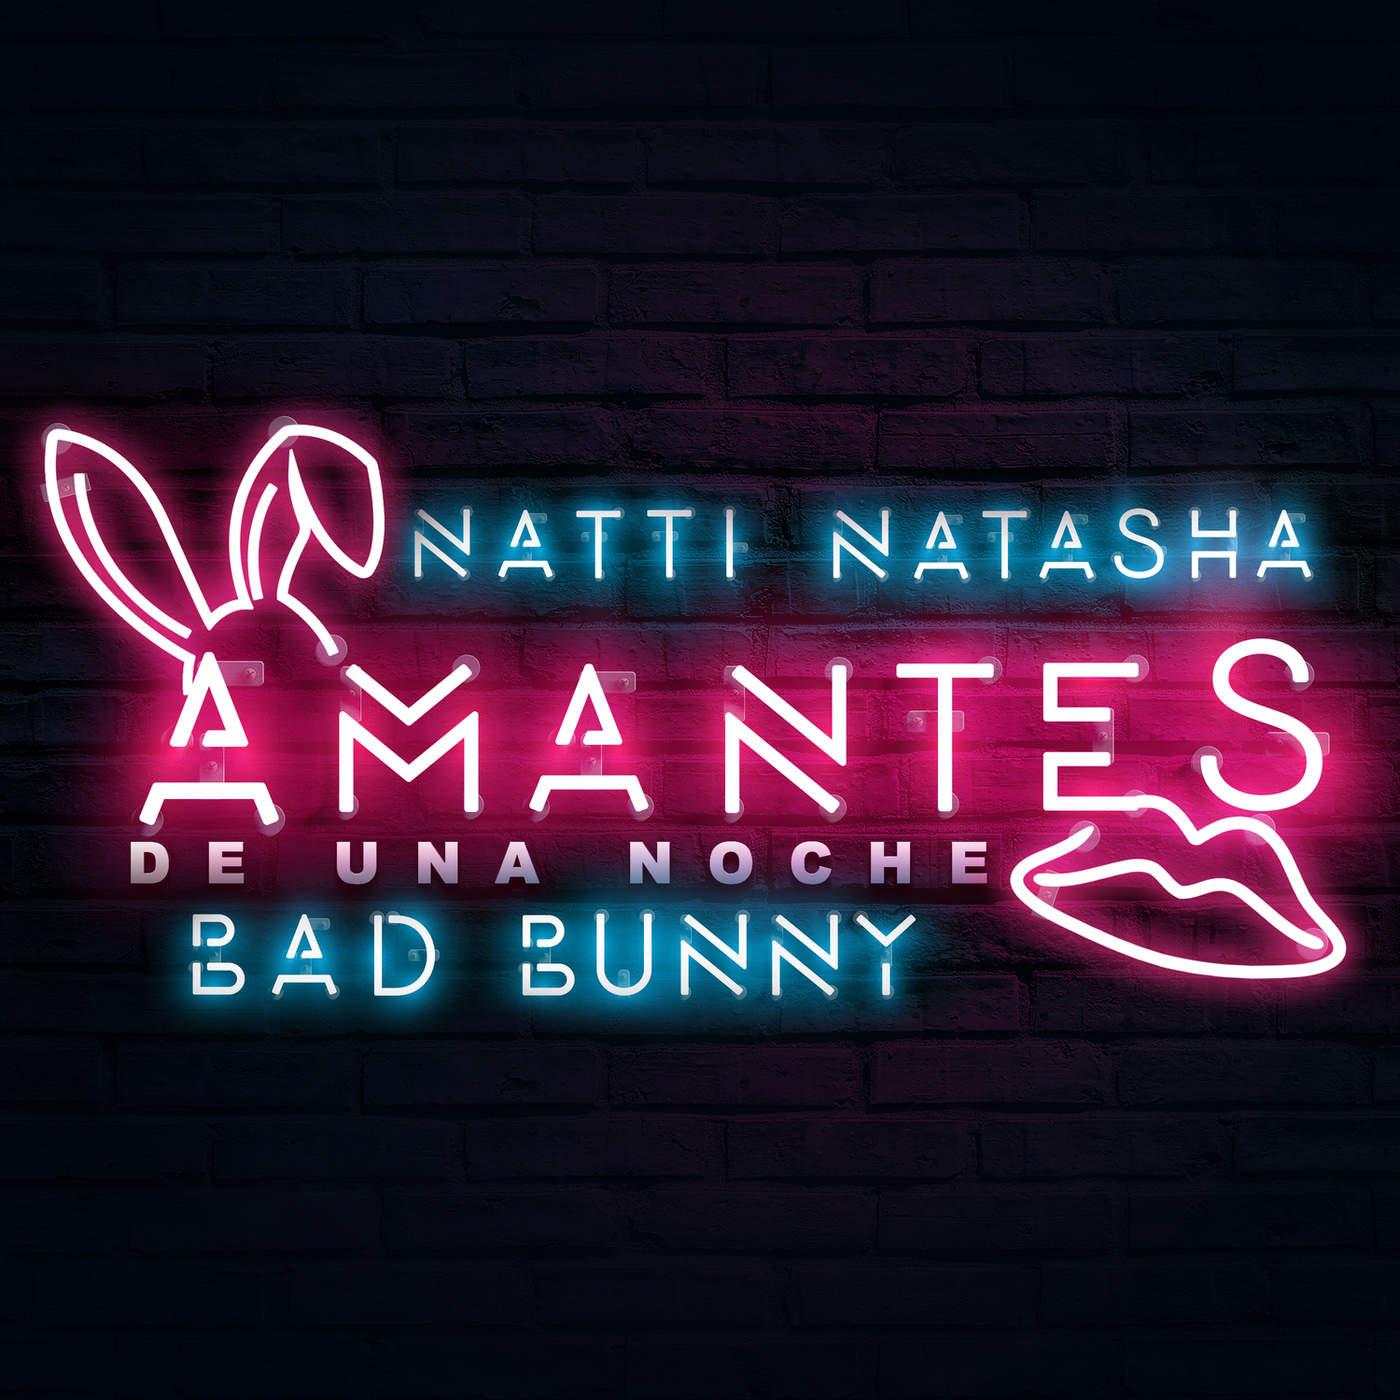 Natti Natasha & Bad Bunny - Amantes de una Noche - Single Cover